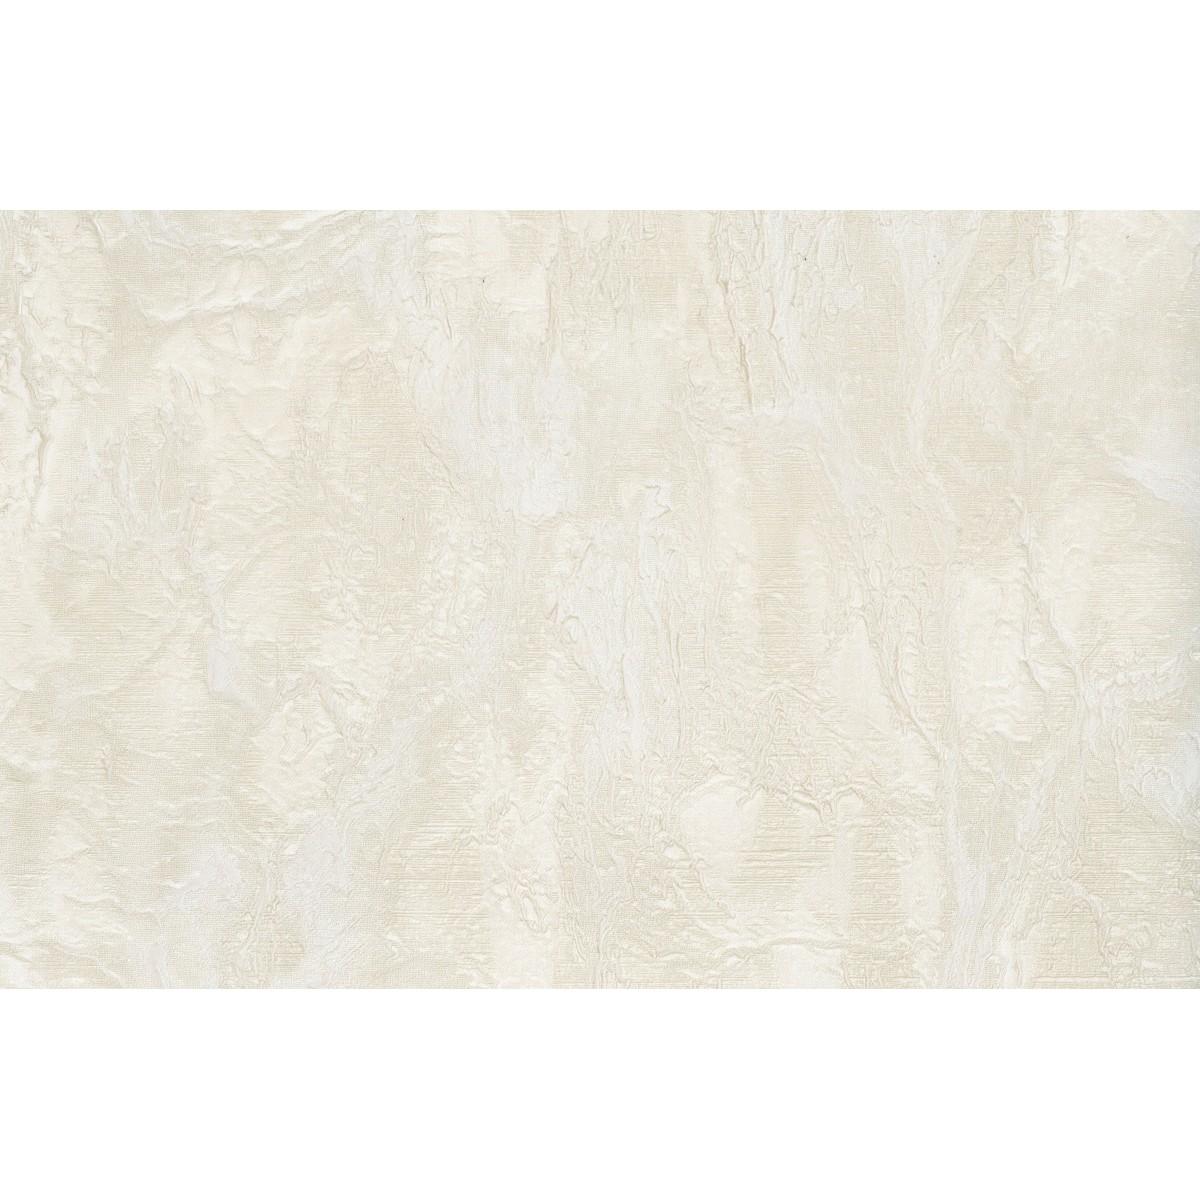 Обои флизелиновые Prima Italiana Bianca 4 белые 1.06 м 20283